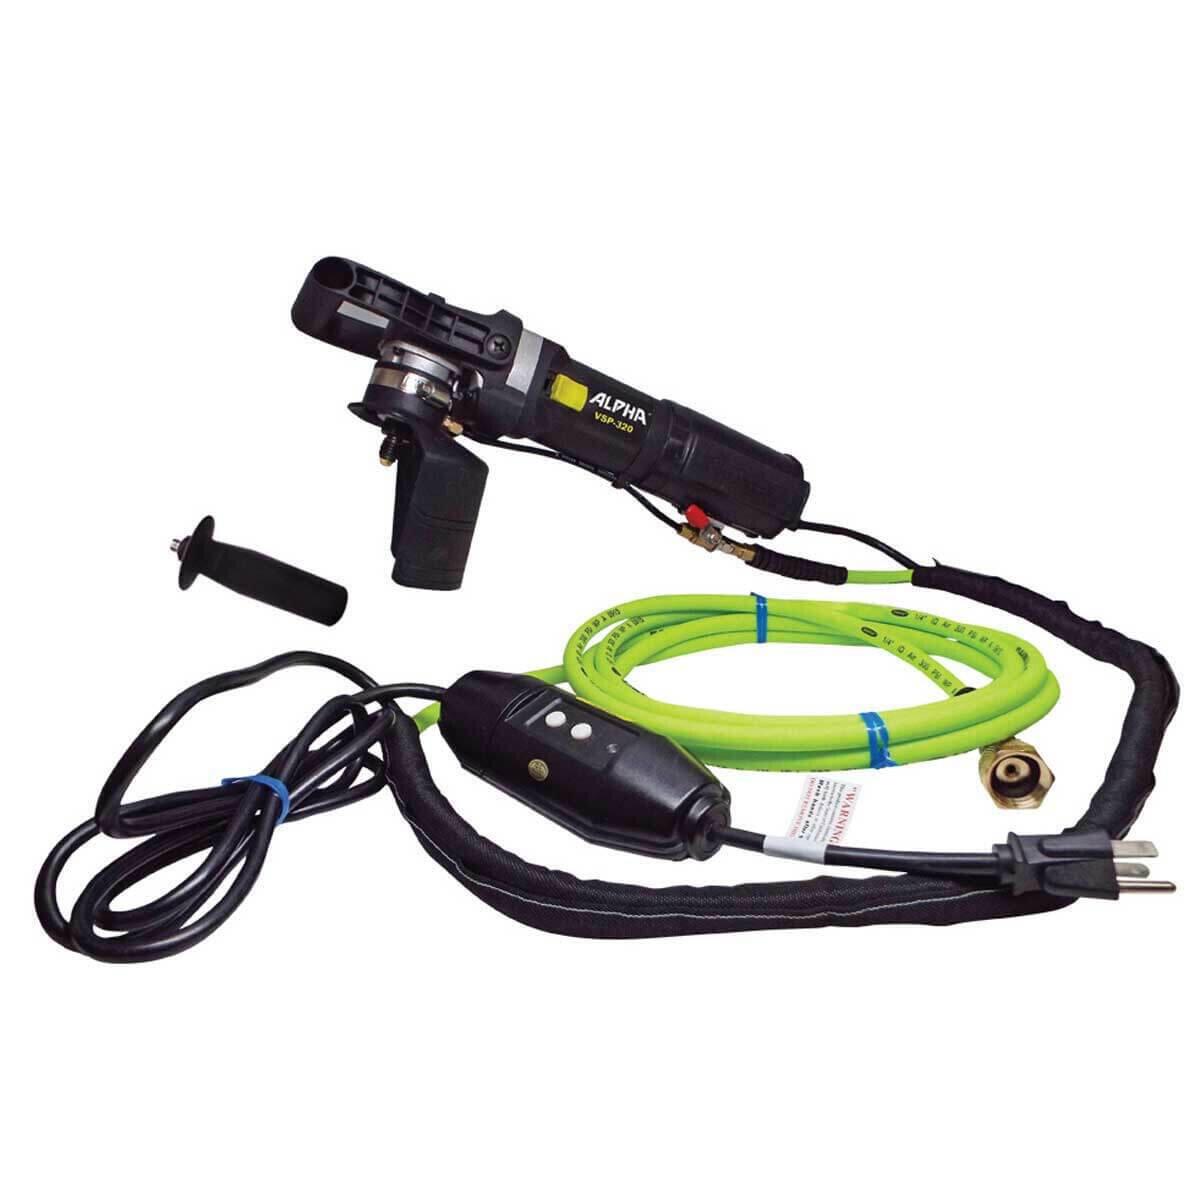 Alpha VSP-320 Polisher with Hose and GFCI Plug